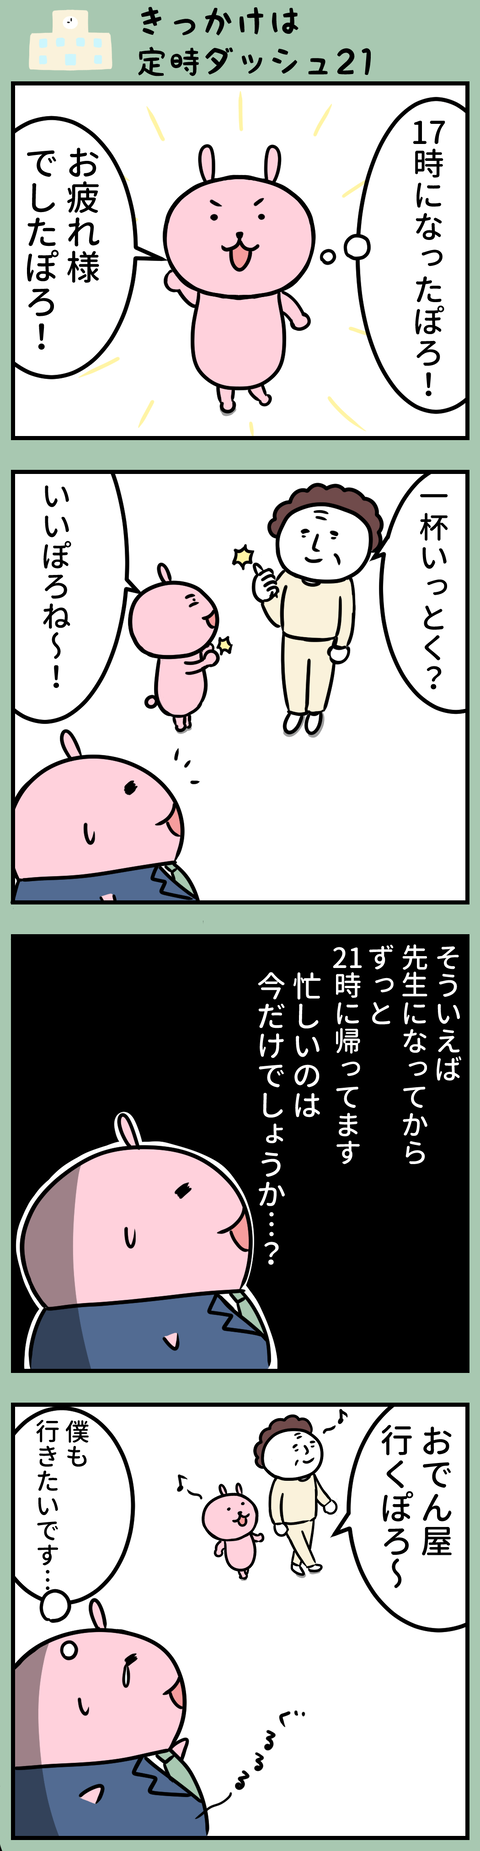 manga-yuzuporo78-1